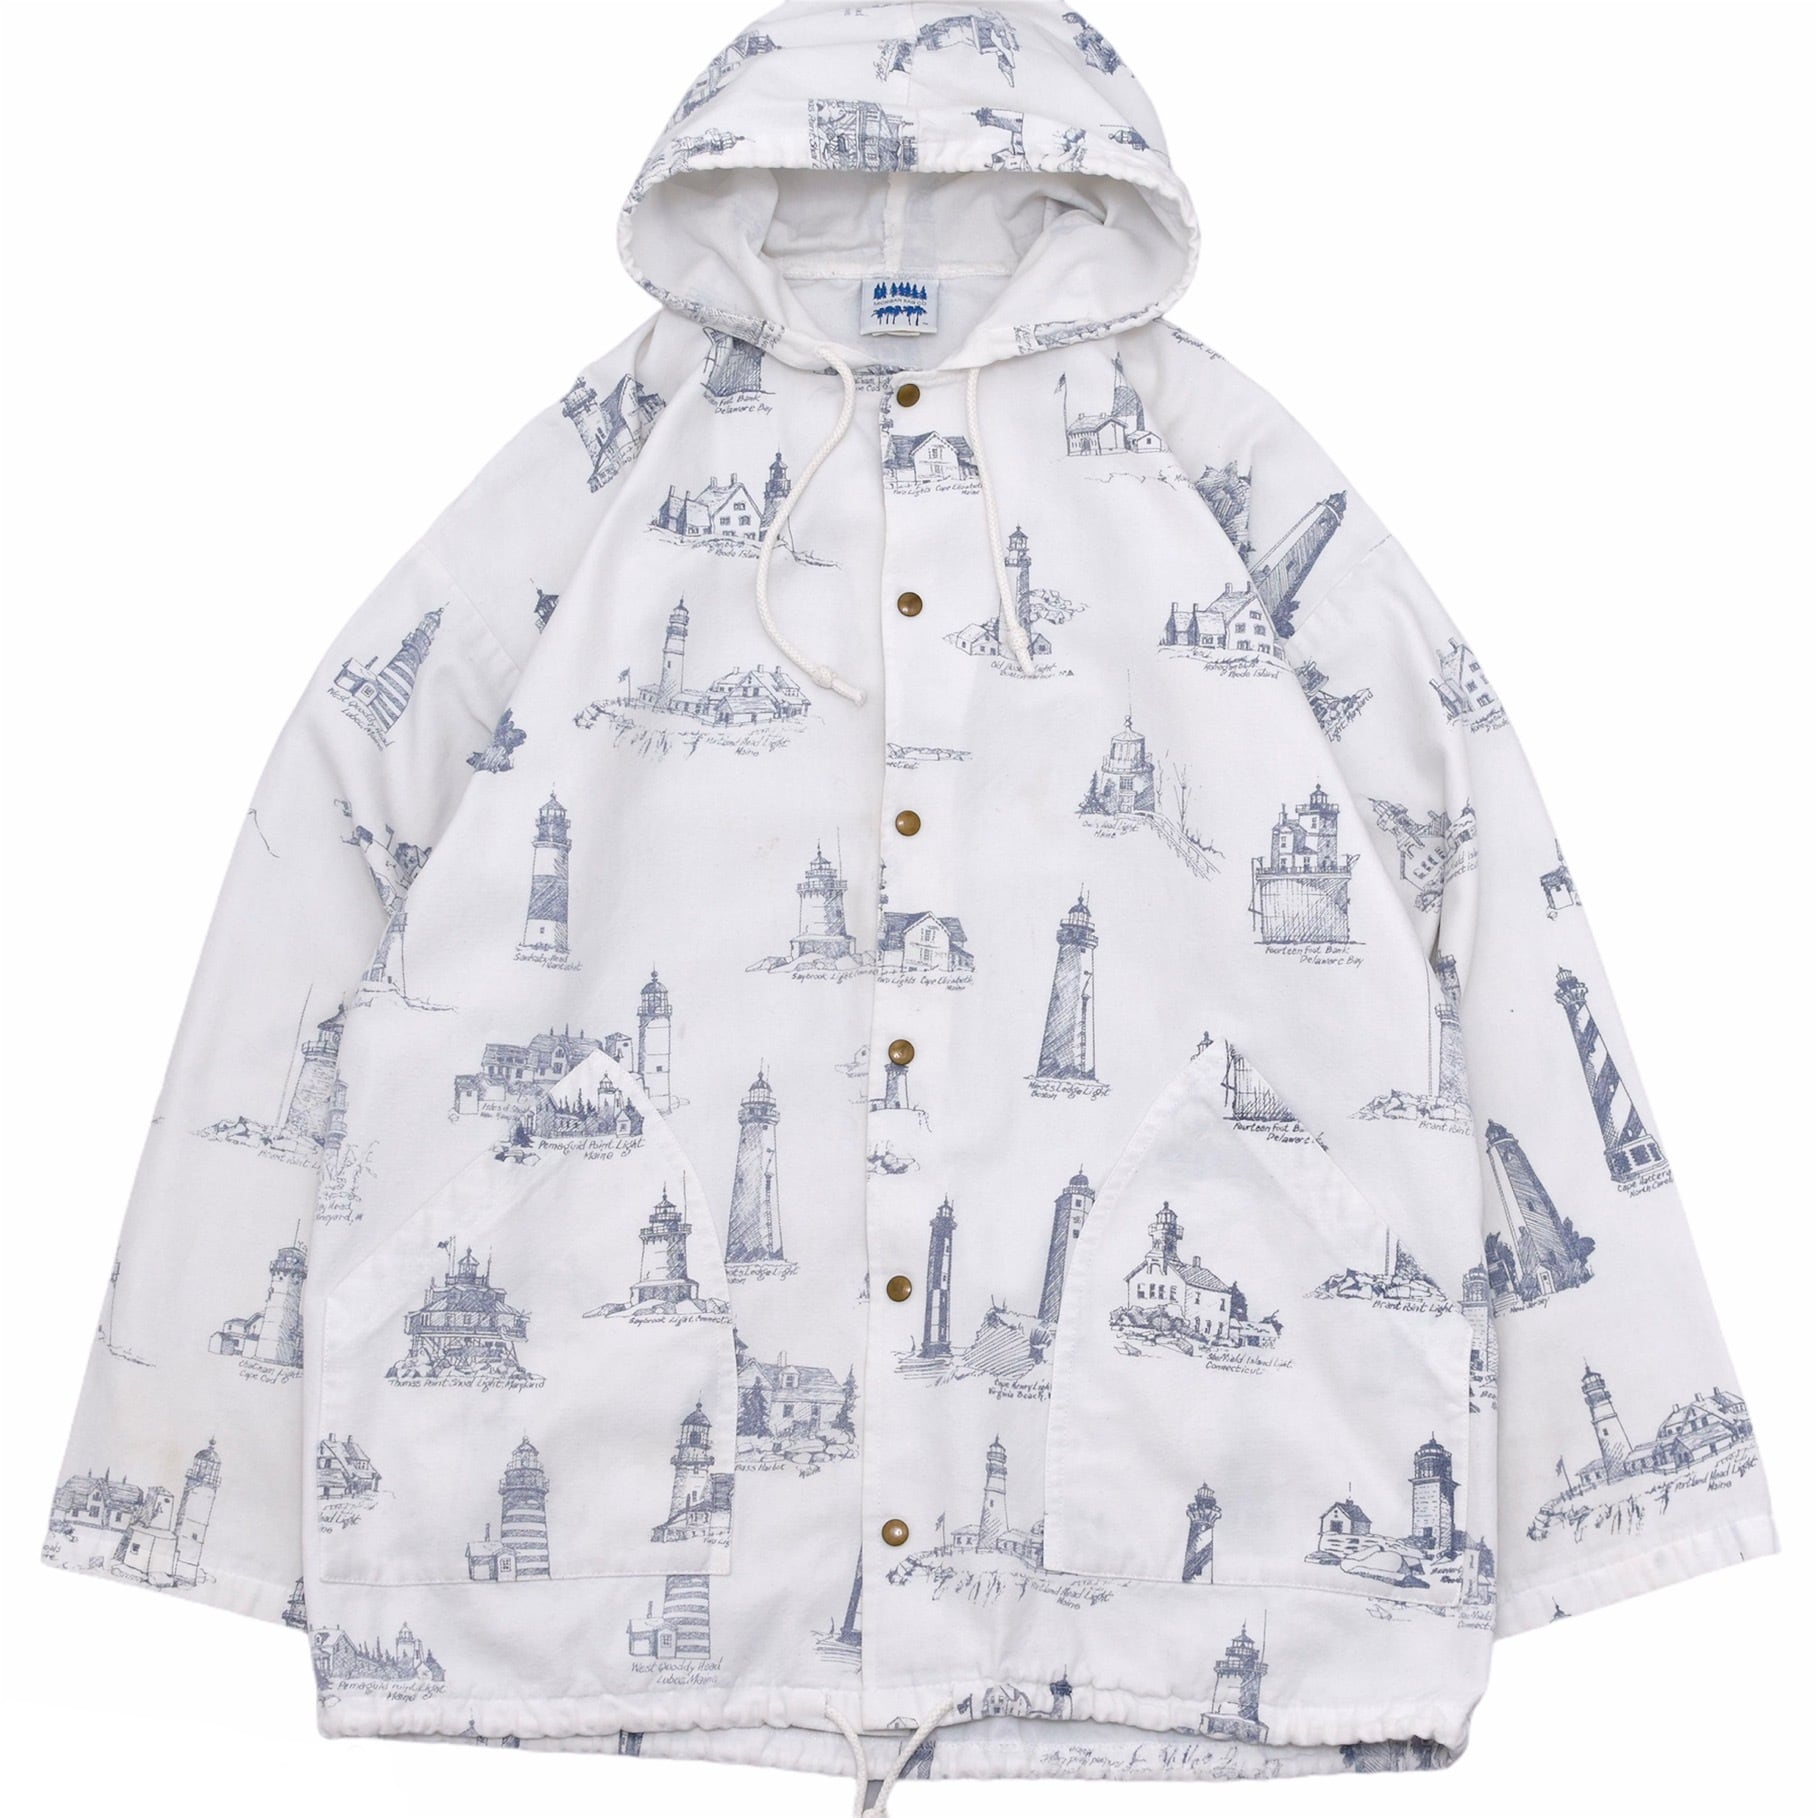 80s-90s MICHIGAN RAG CO cotton jacket